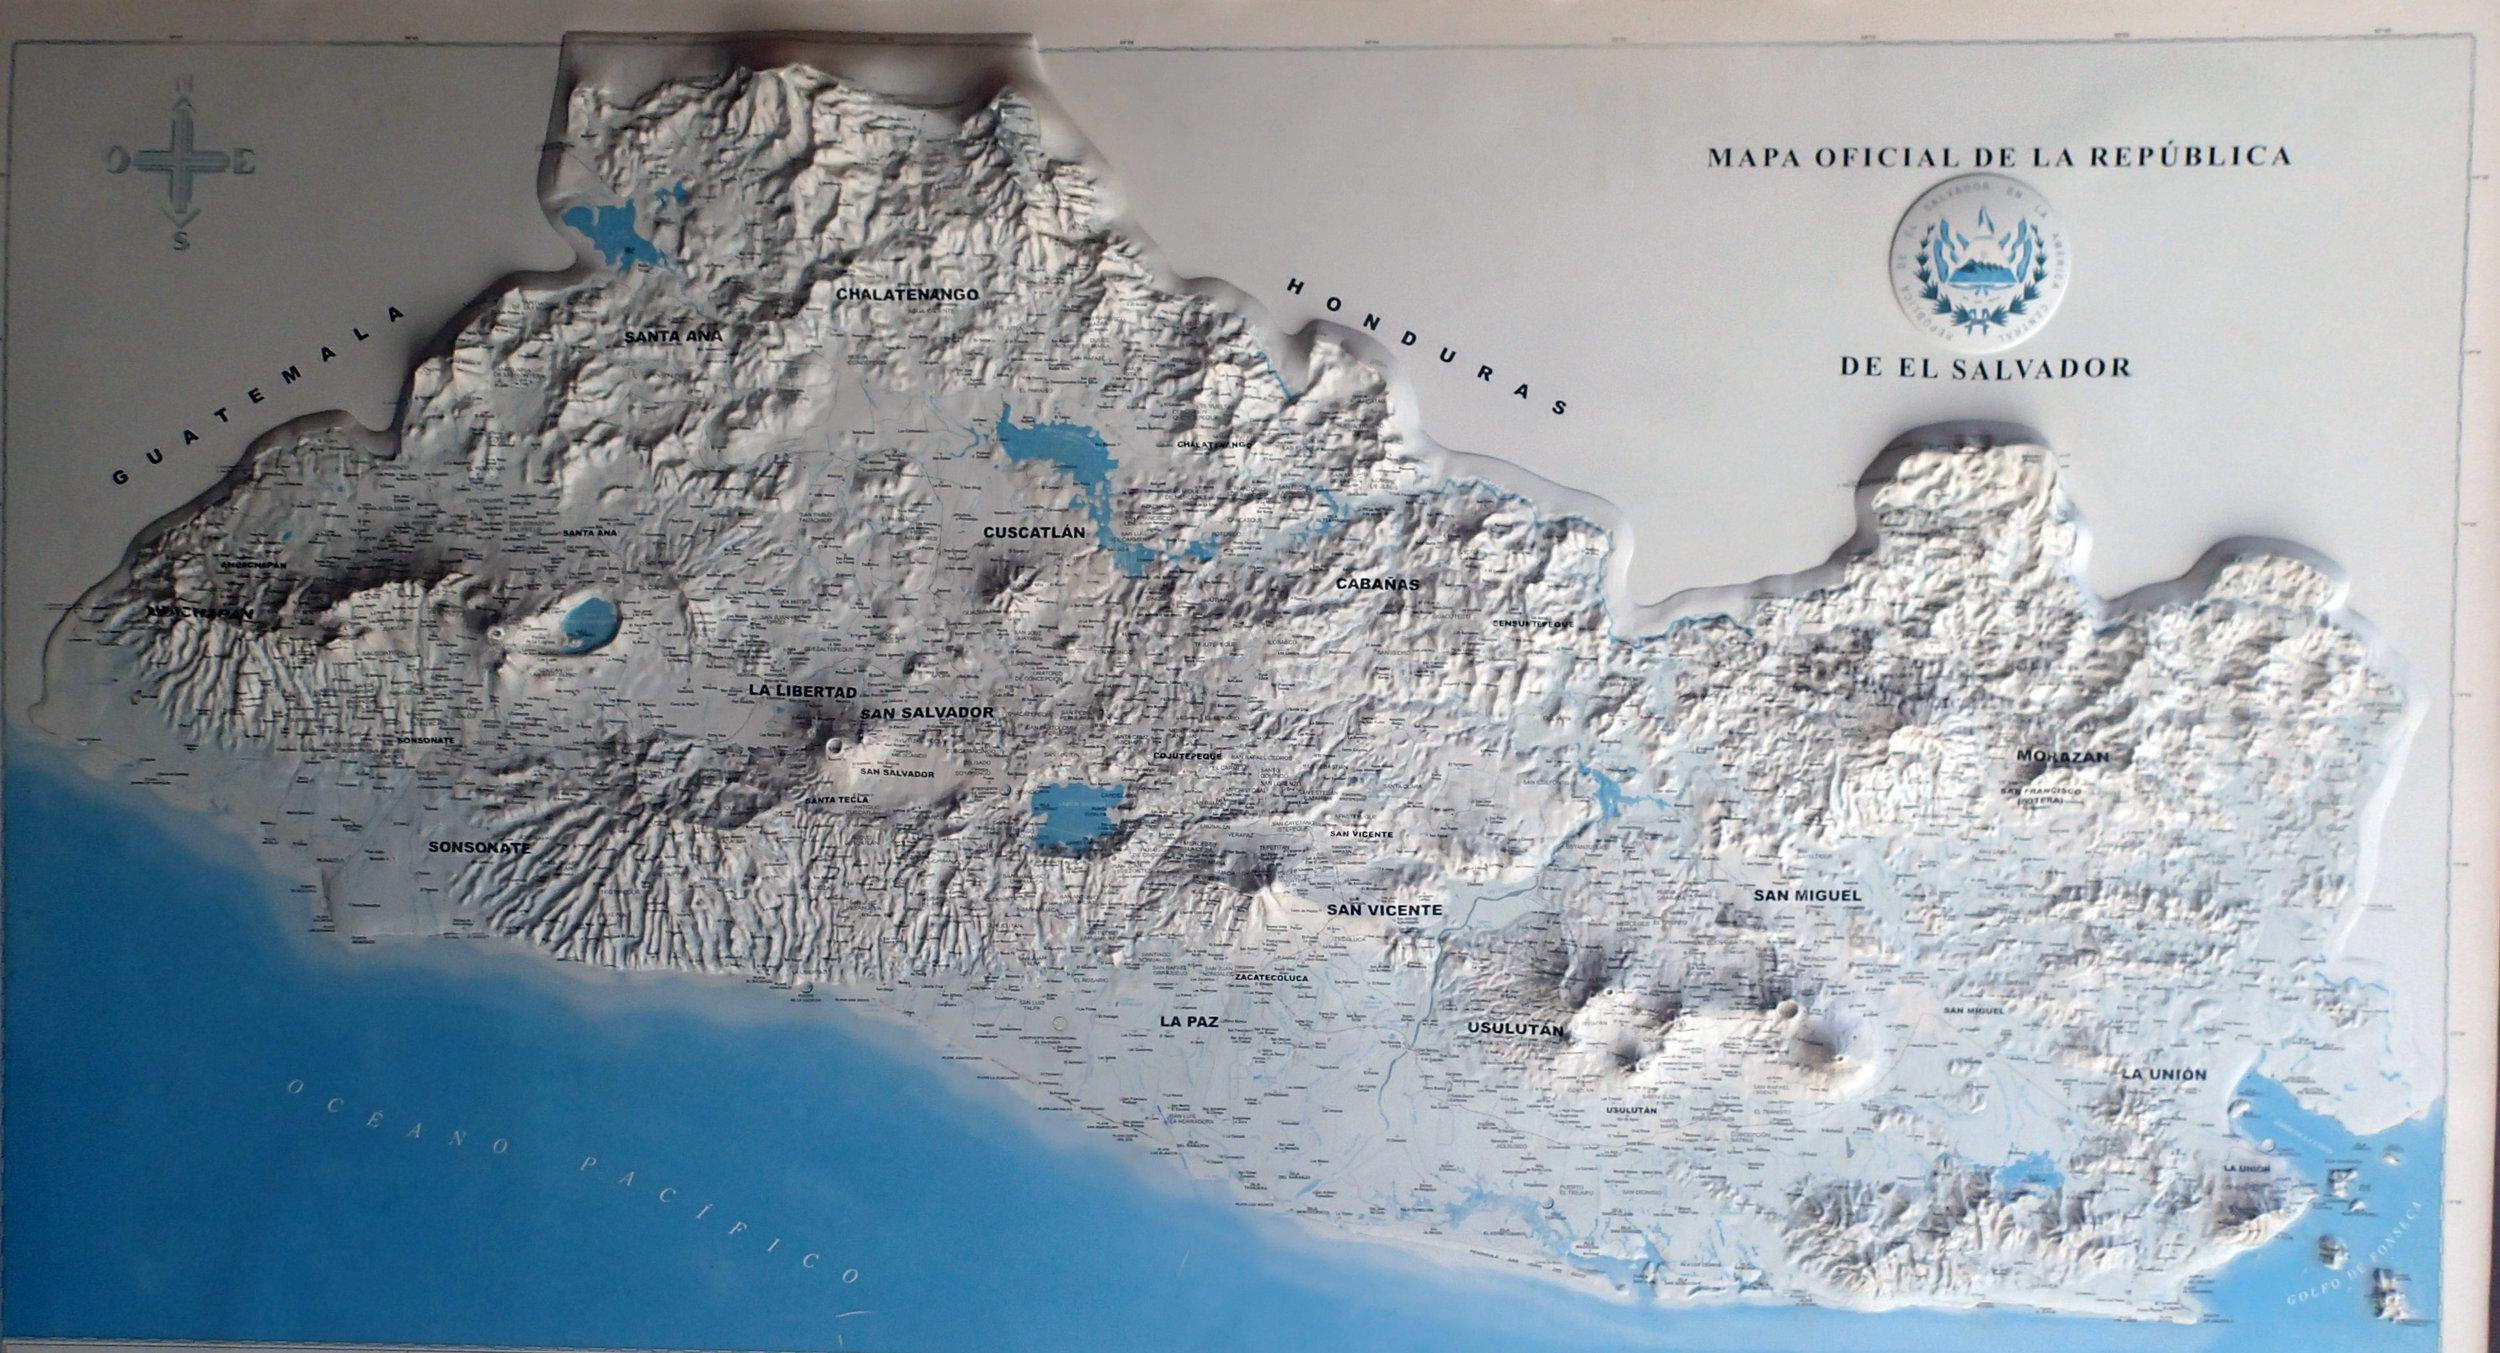 El Salvador map.jpg